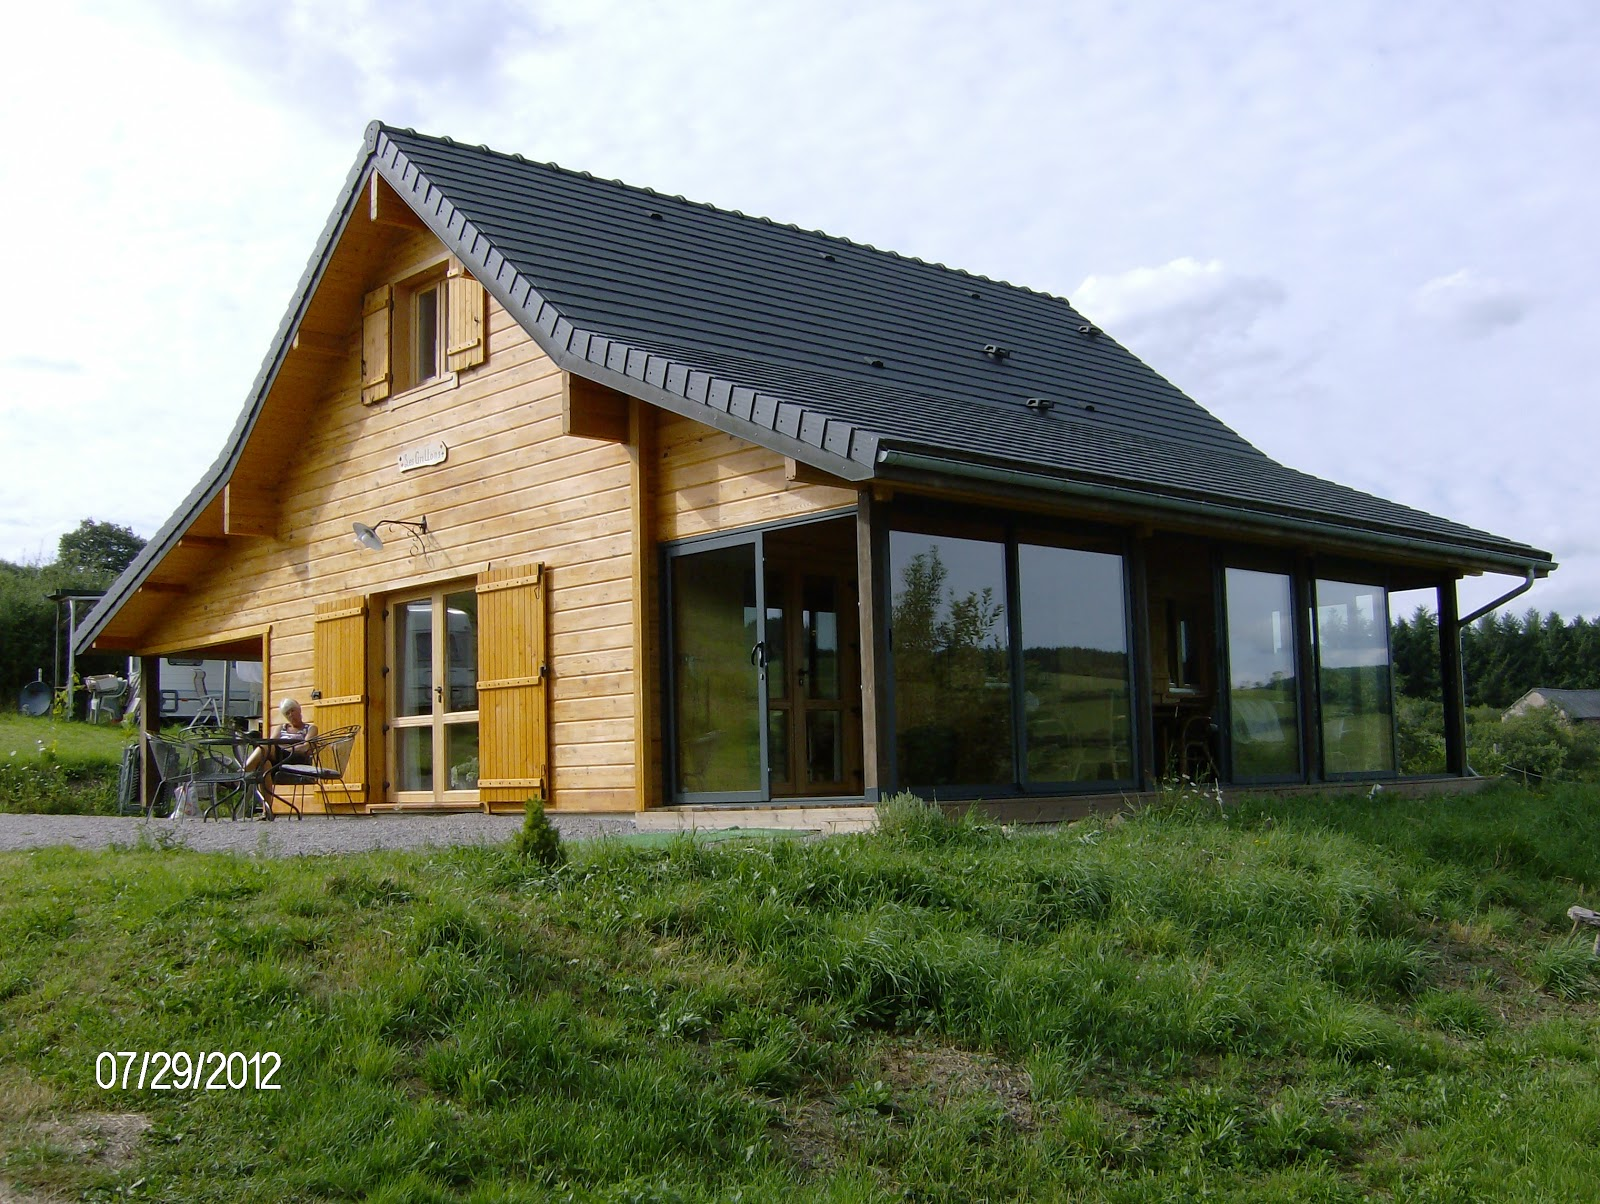 Vakantiehuis les grillons - Huis met veranda binnenkomst ...